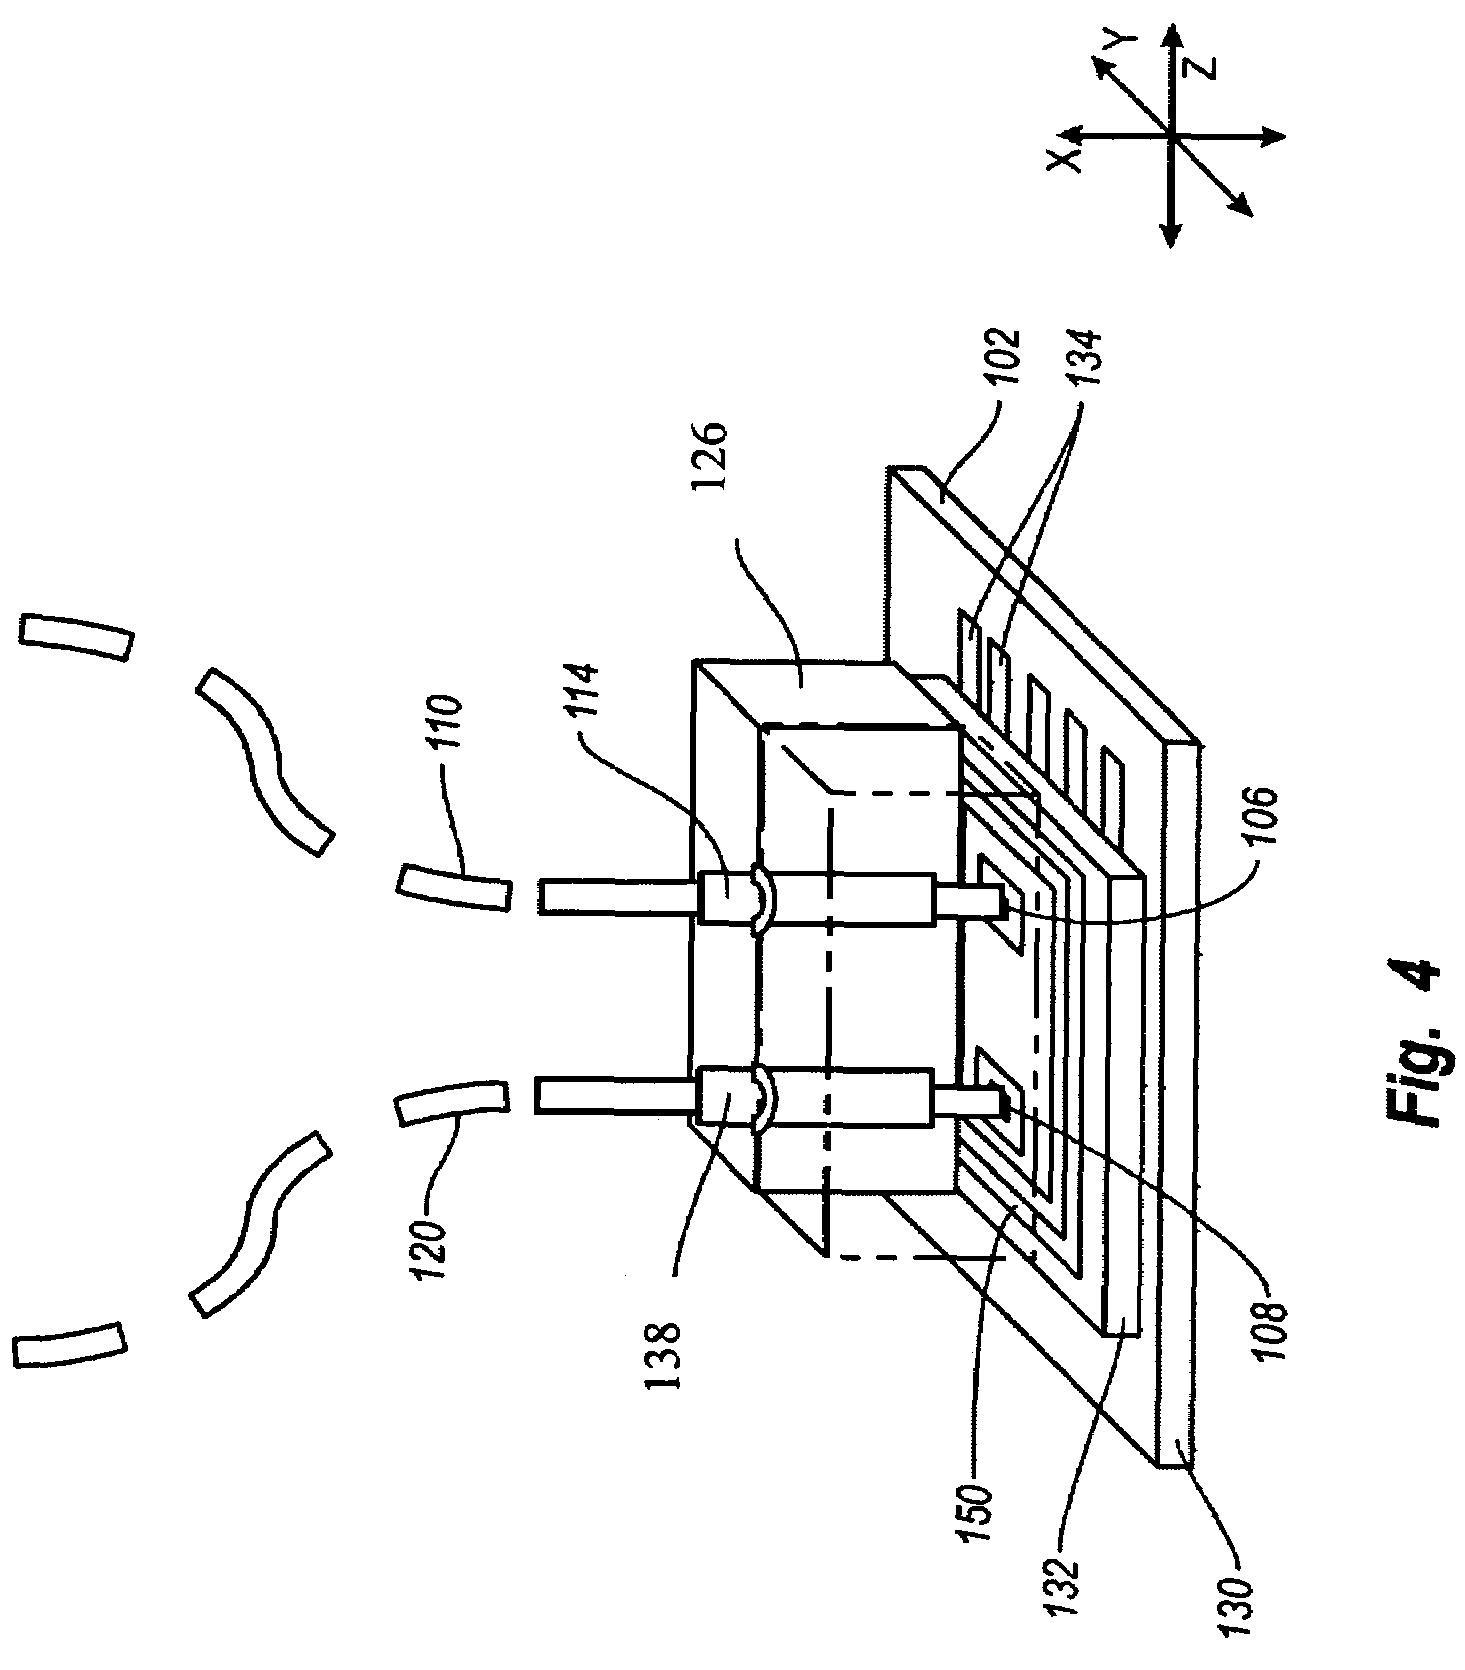 Thunderheart ignition wiring diagram wiring diagram and fuse box thunderheart ignition module big dog at thunderheart